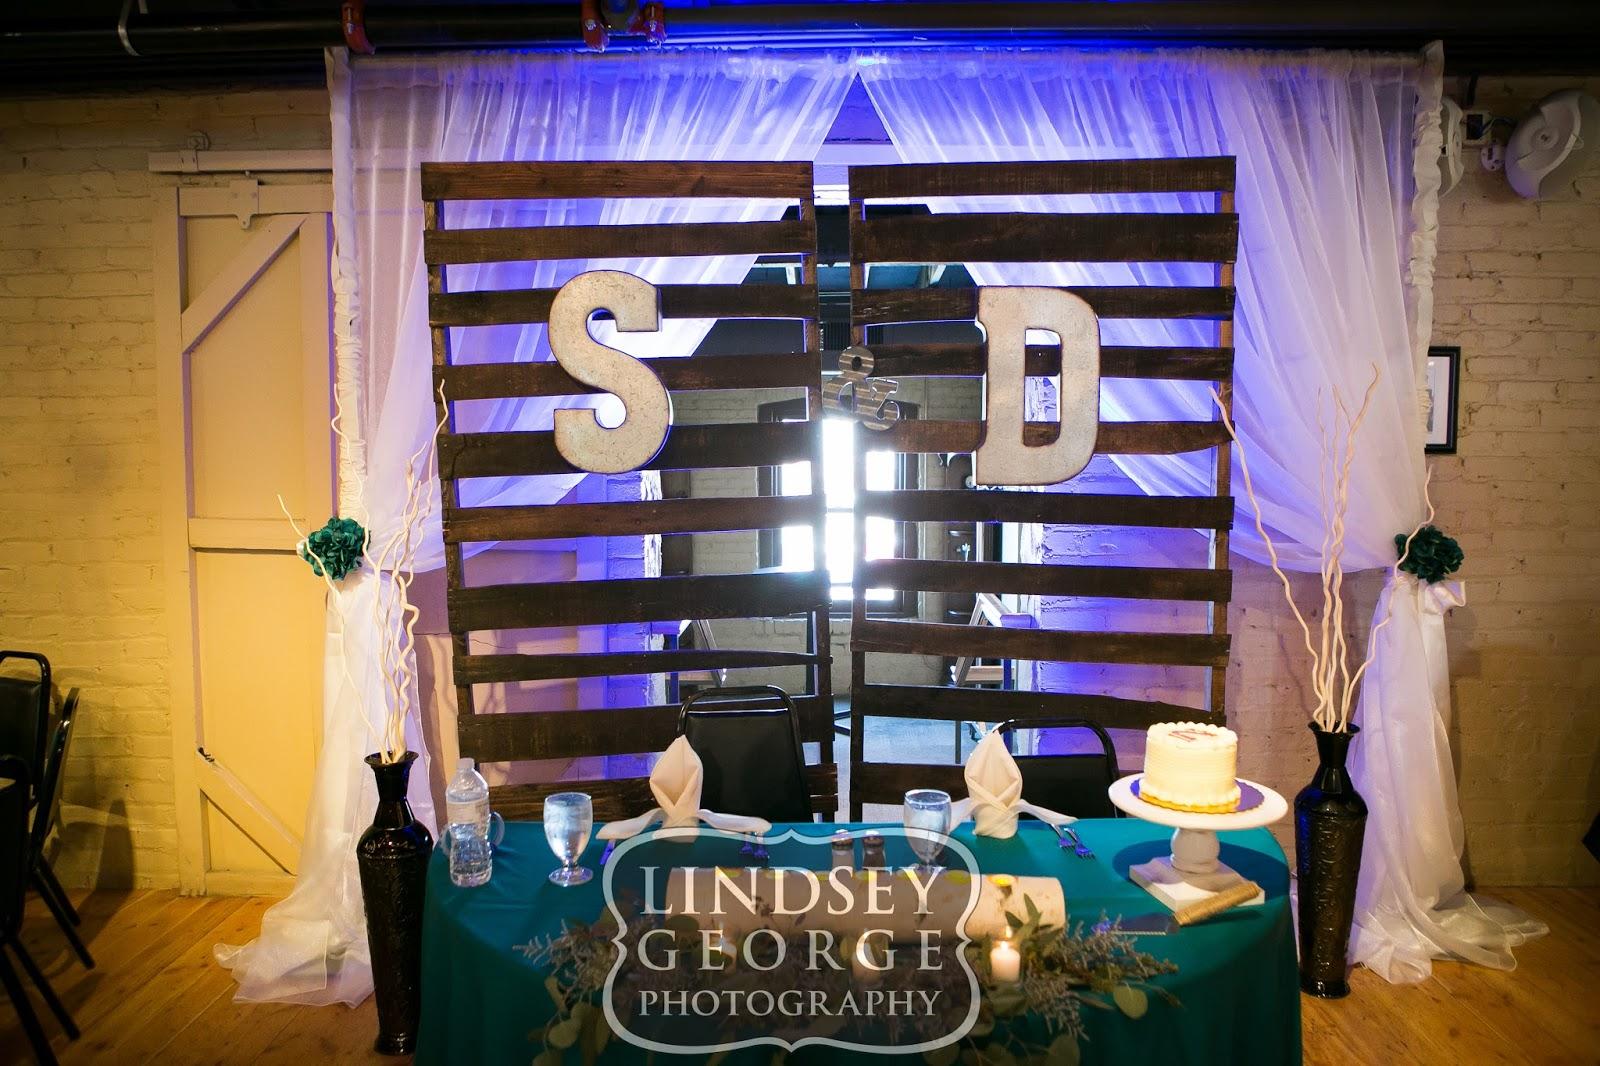 Lindsey George graphy Council Bluffs IA Wedding